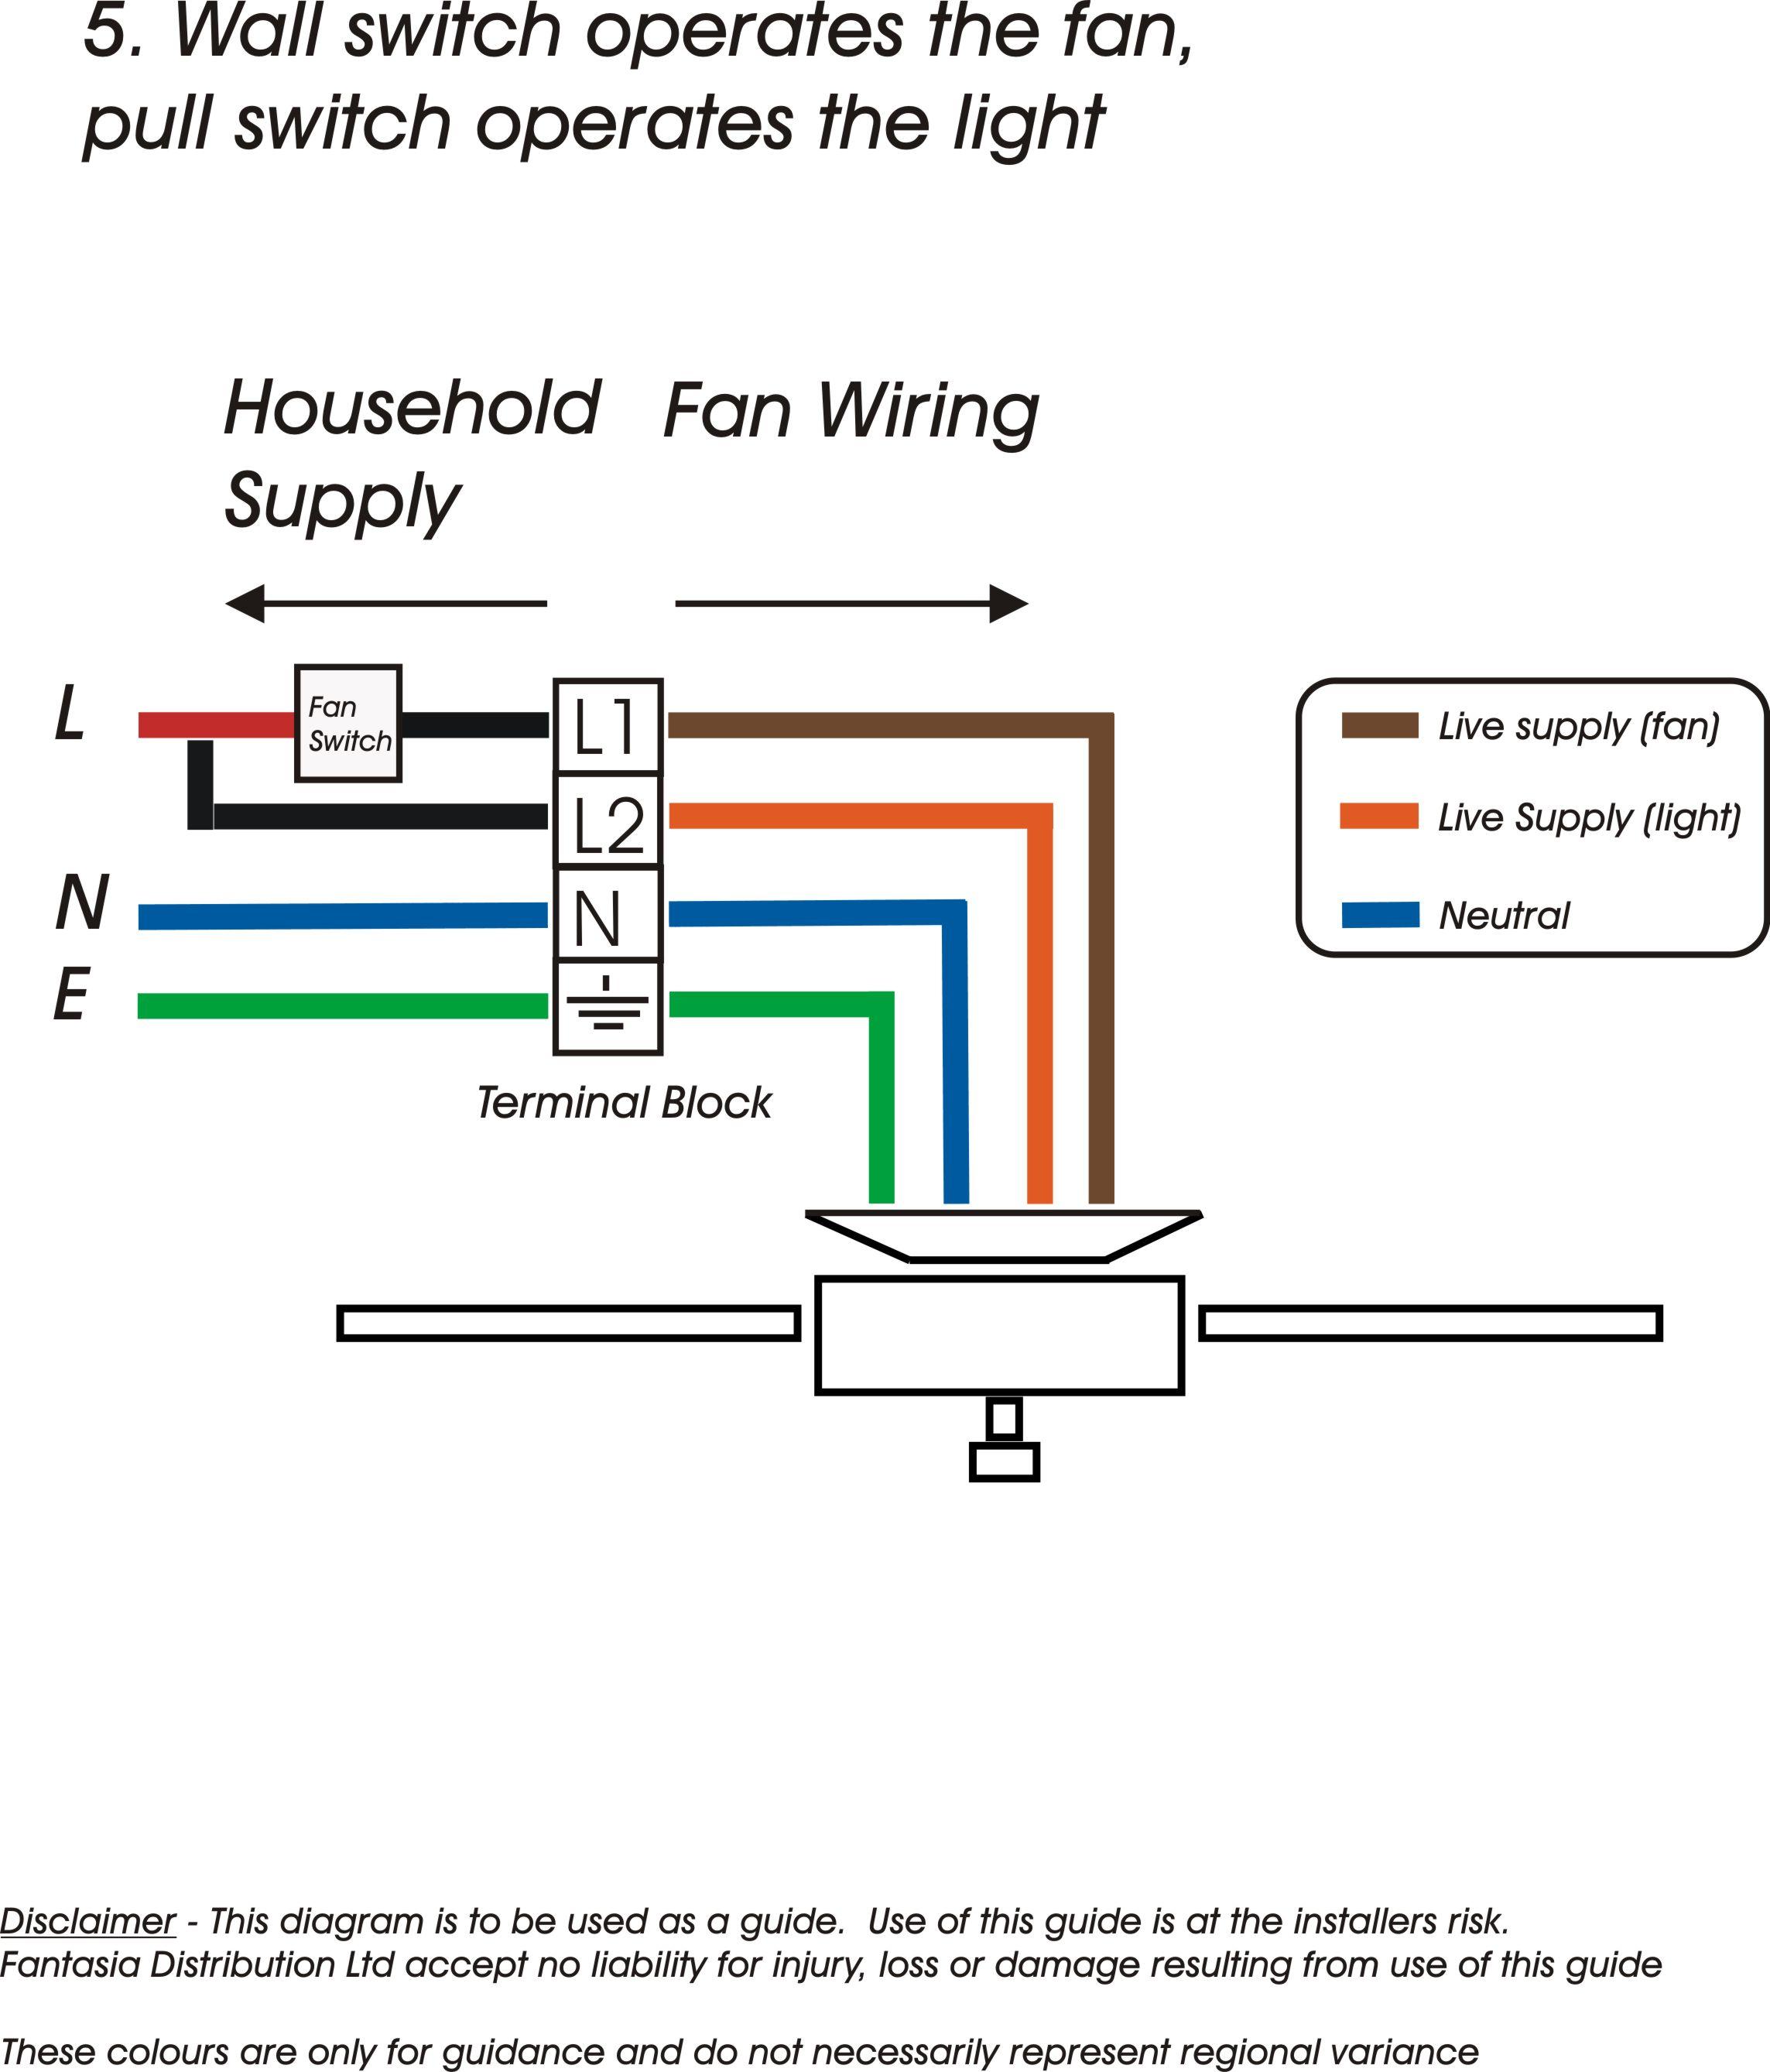 Peachy Fan Switch Wiring Basic Electronics Wiring Diagram Wiring Cloud Apomsimijknierdonabenoleattemohammedshrineorg